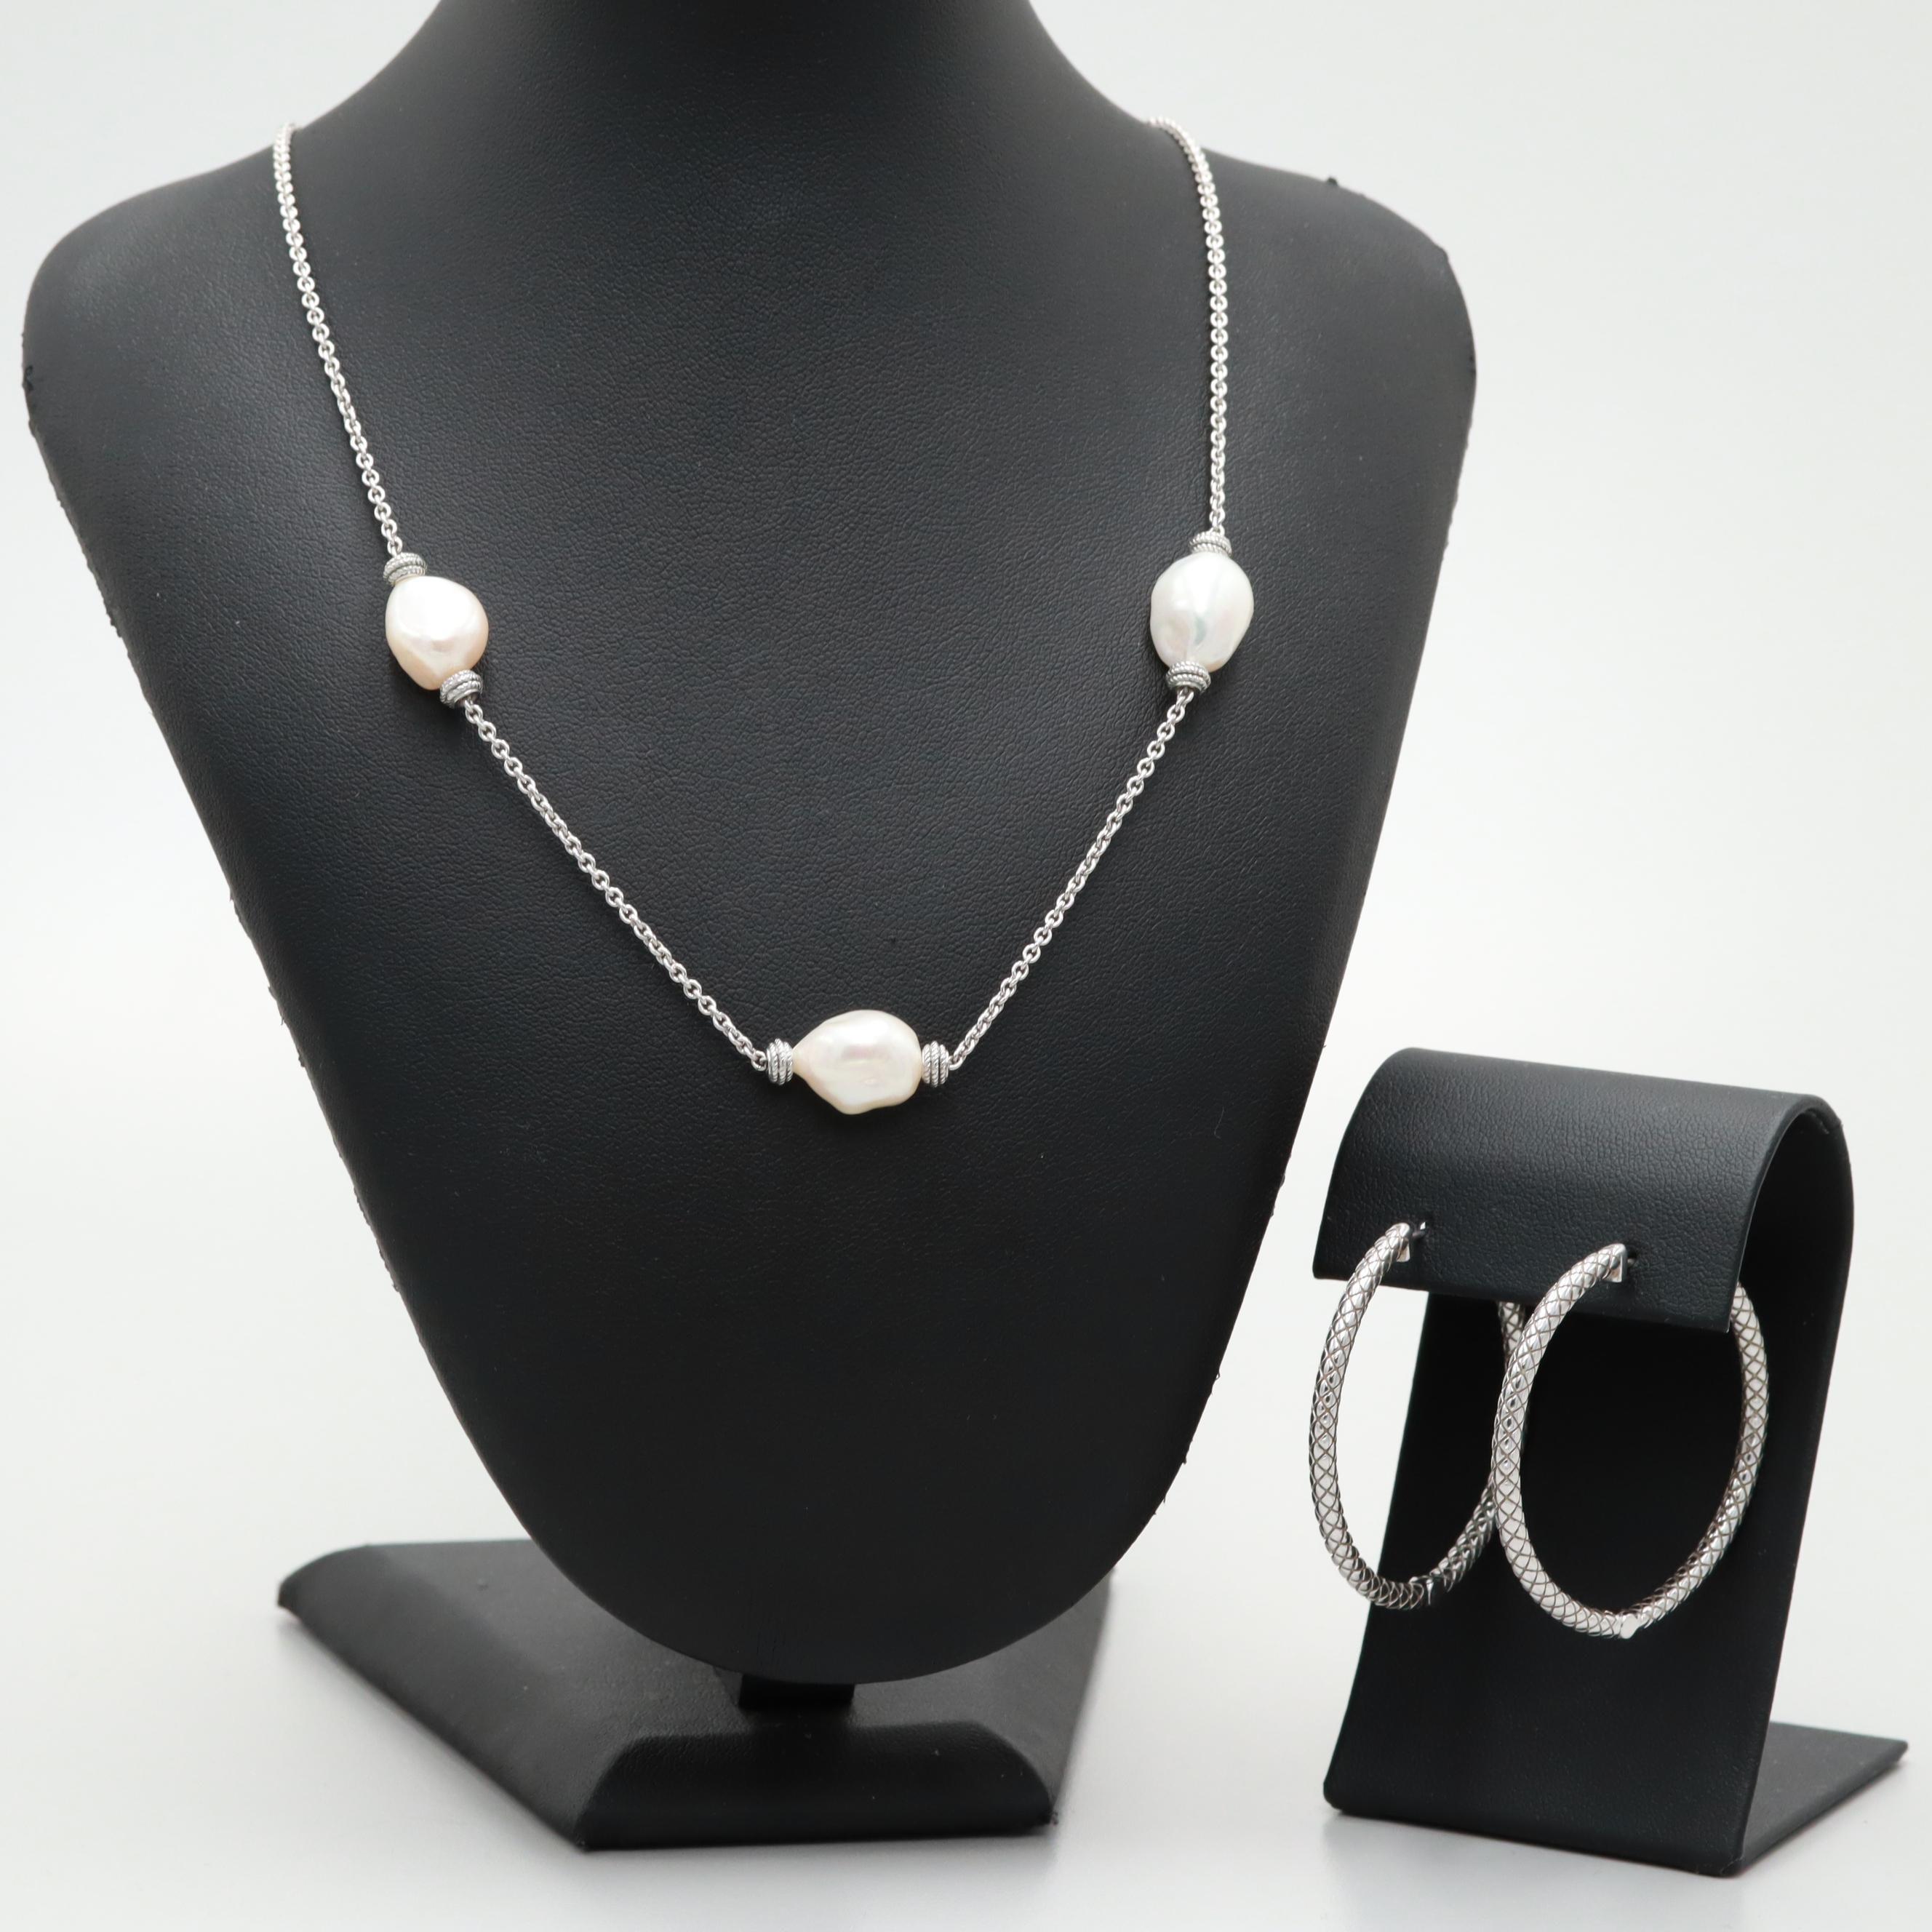 Sterling Silver Hoop Earrings and Leslie Greene Cultured Pearl Necklace Set